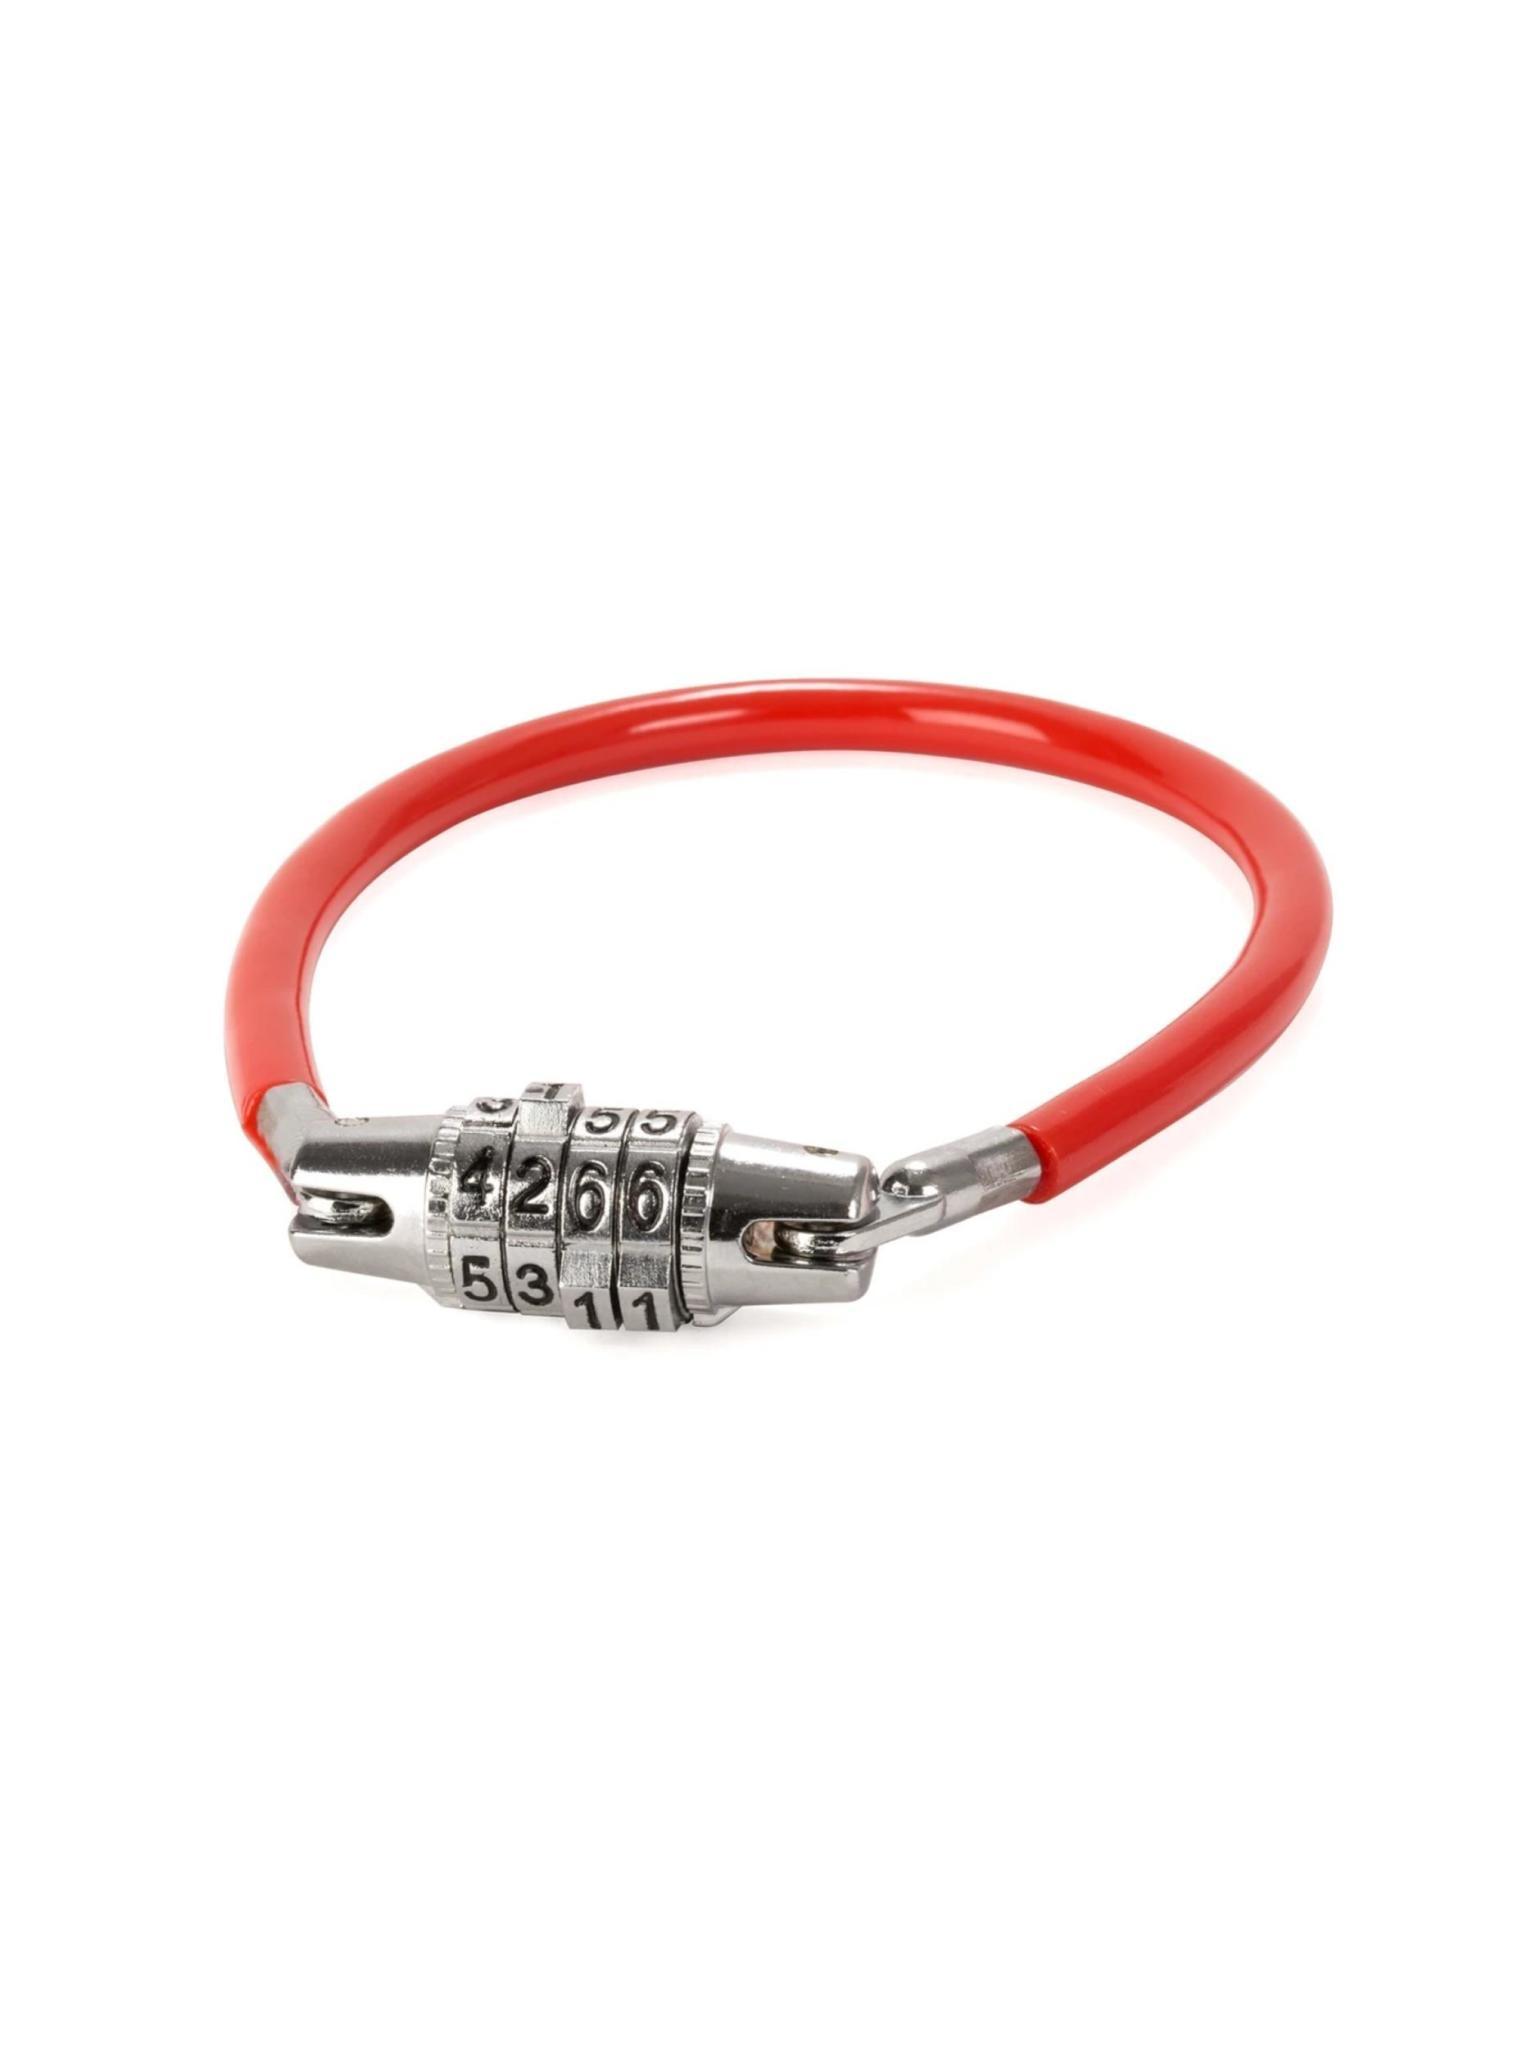 Kikkerland Mini Bike Lock Red